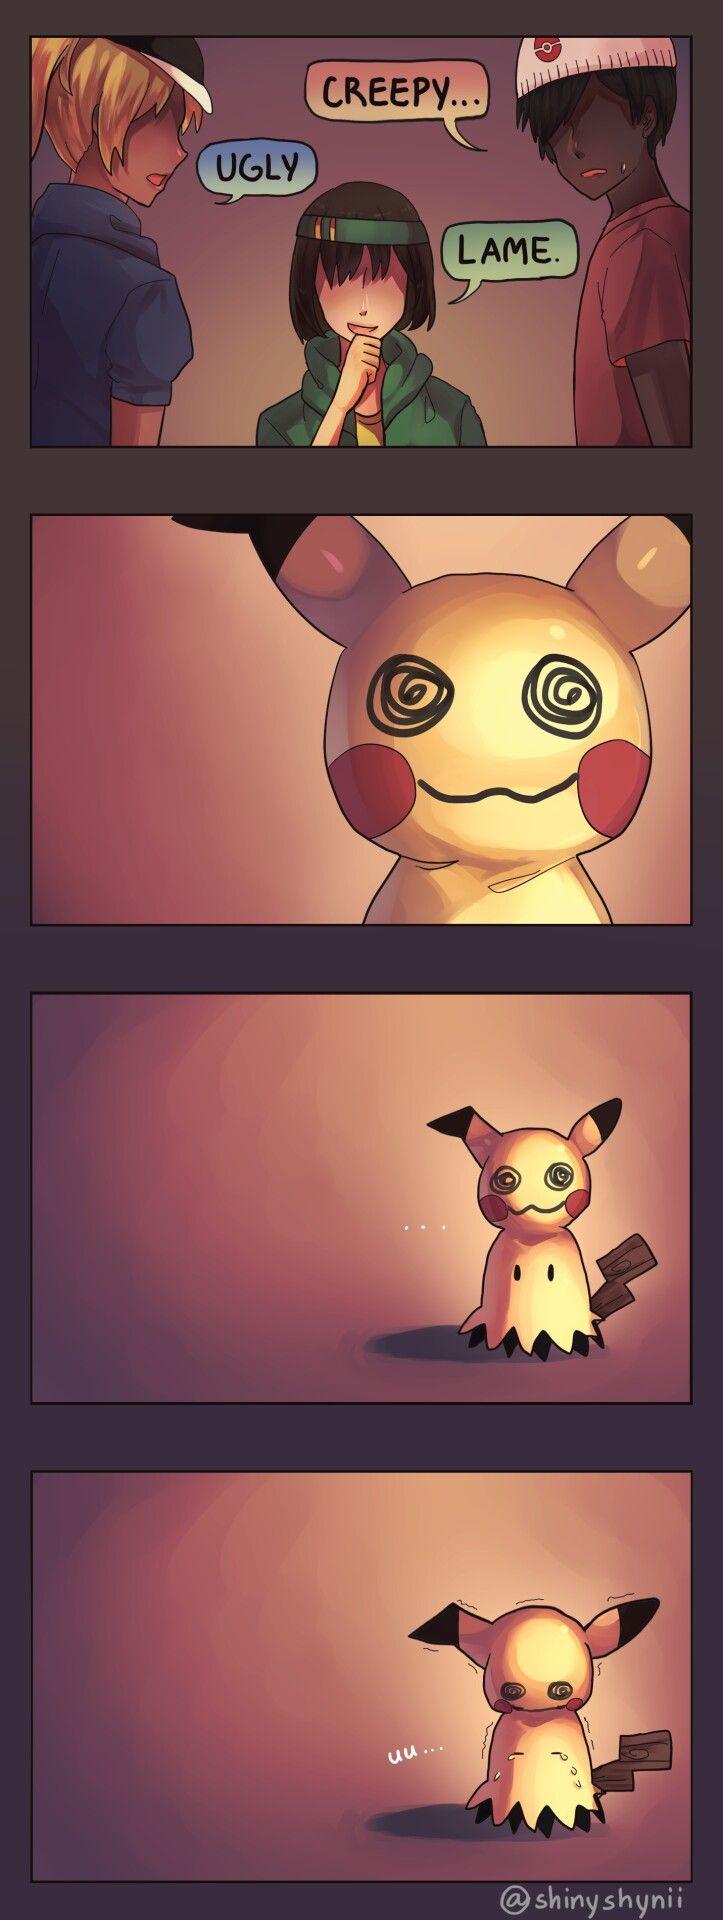 Mimikyu, sad, crying, comic, Trainers, ugly, creepy, lame, text; Pokémon